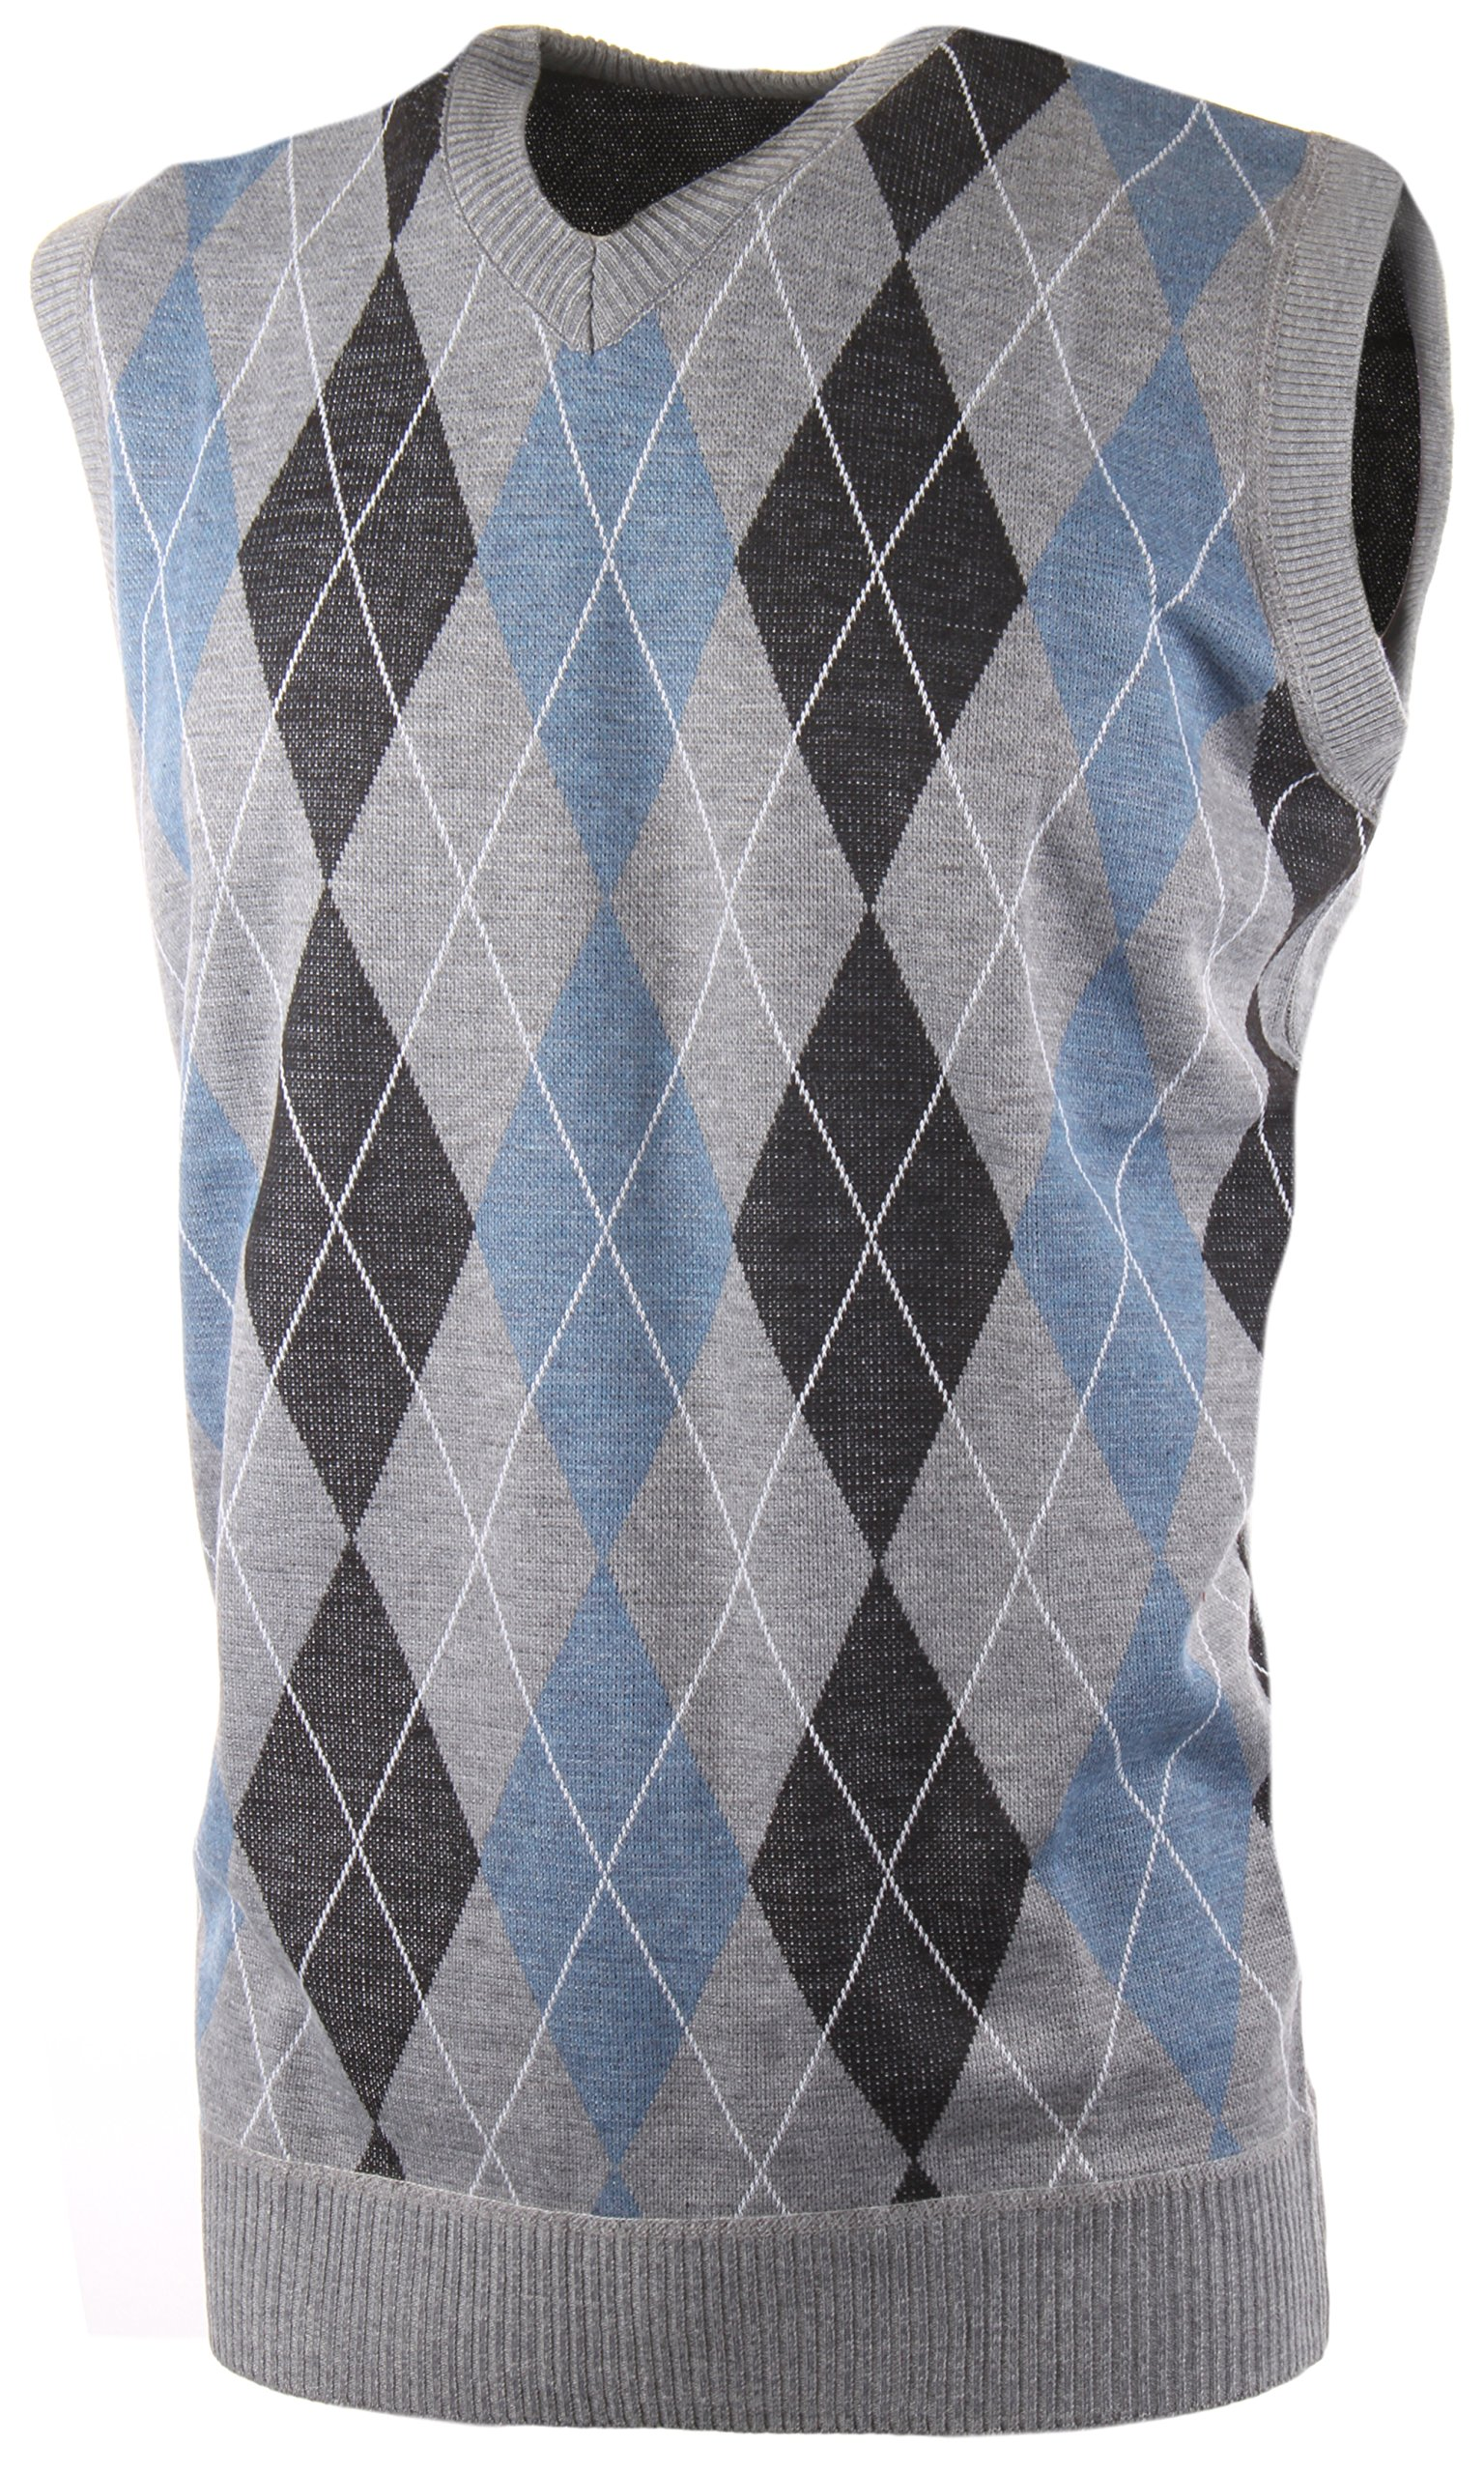 Enimay Men's Business Casual Fashion V Neck Argyle Golf Sweater Vest Argyle Grey   Blue Small